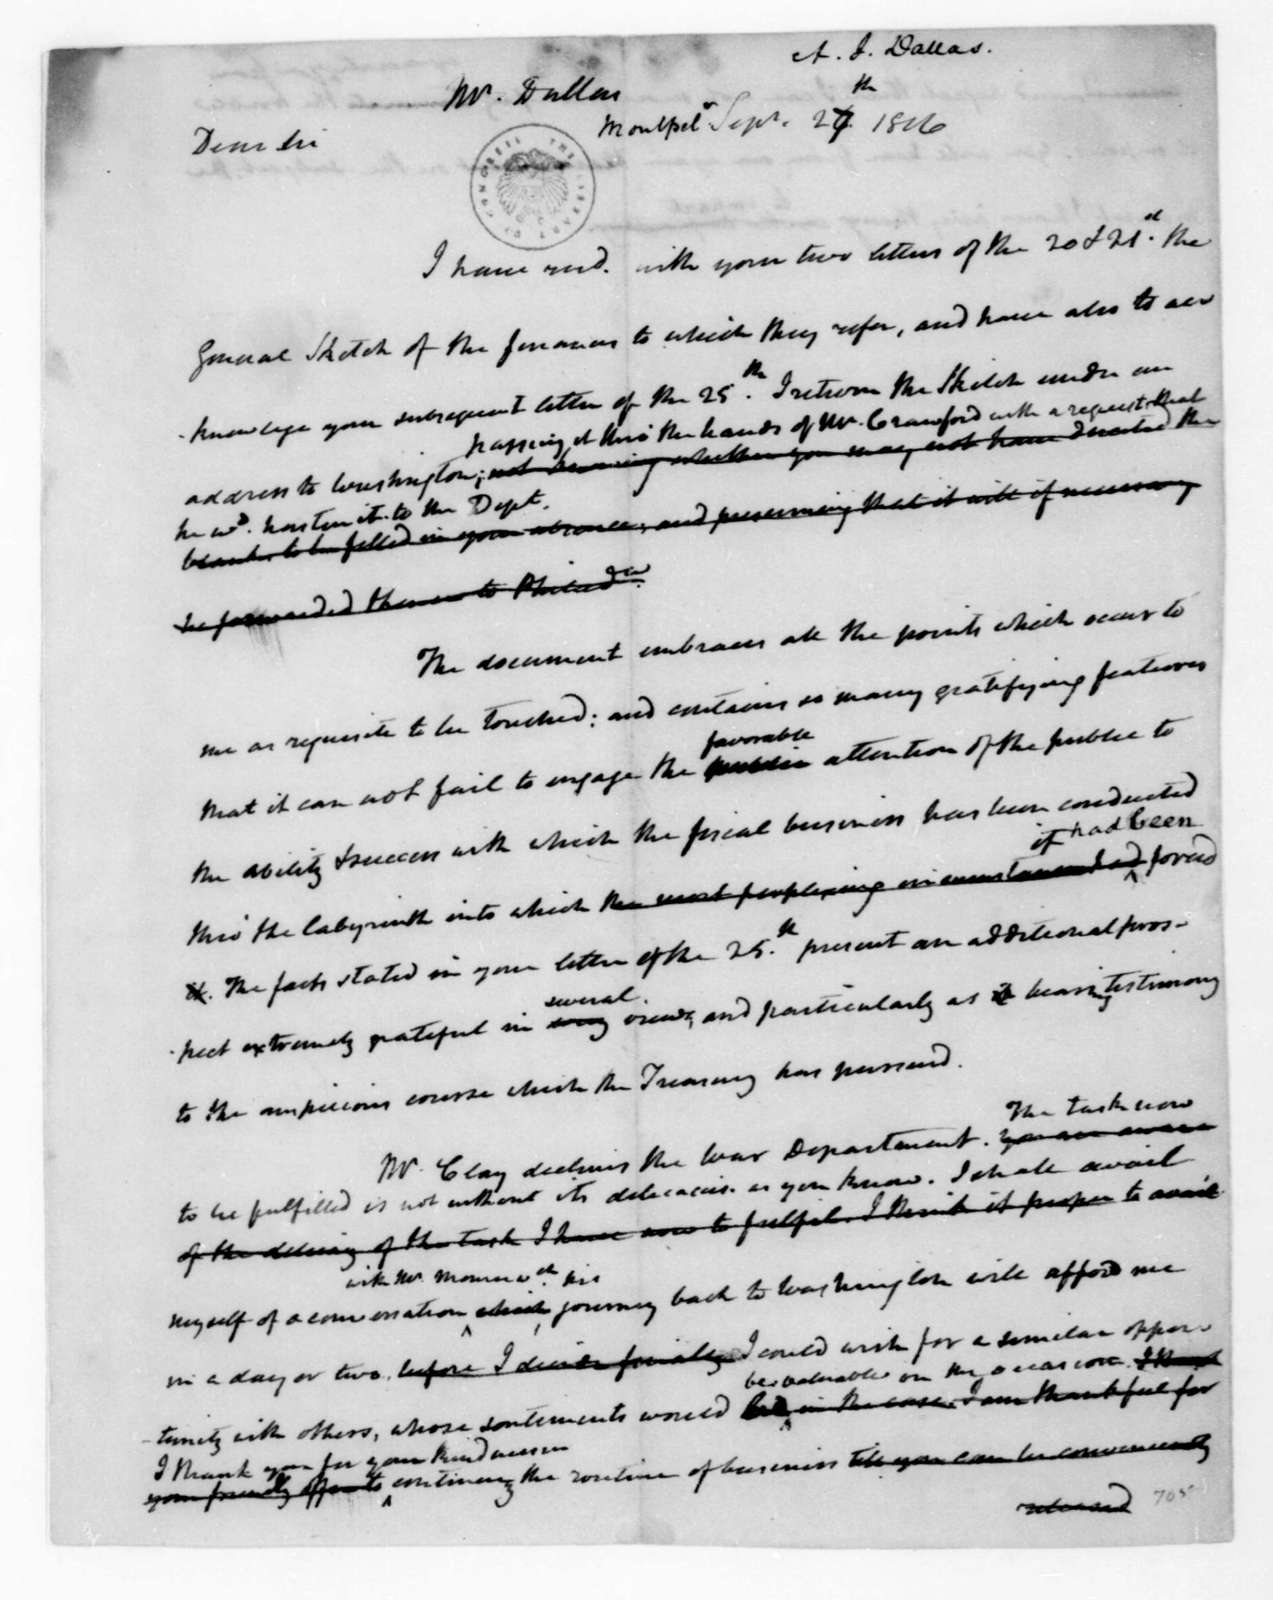 James Madison to Alexander J. Dallas, September 27, 1816.